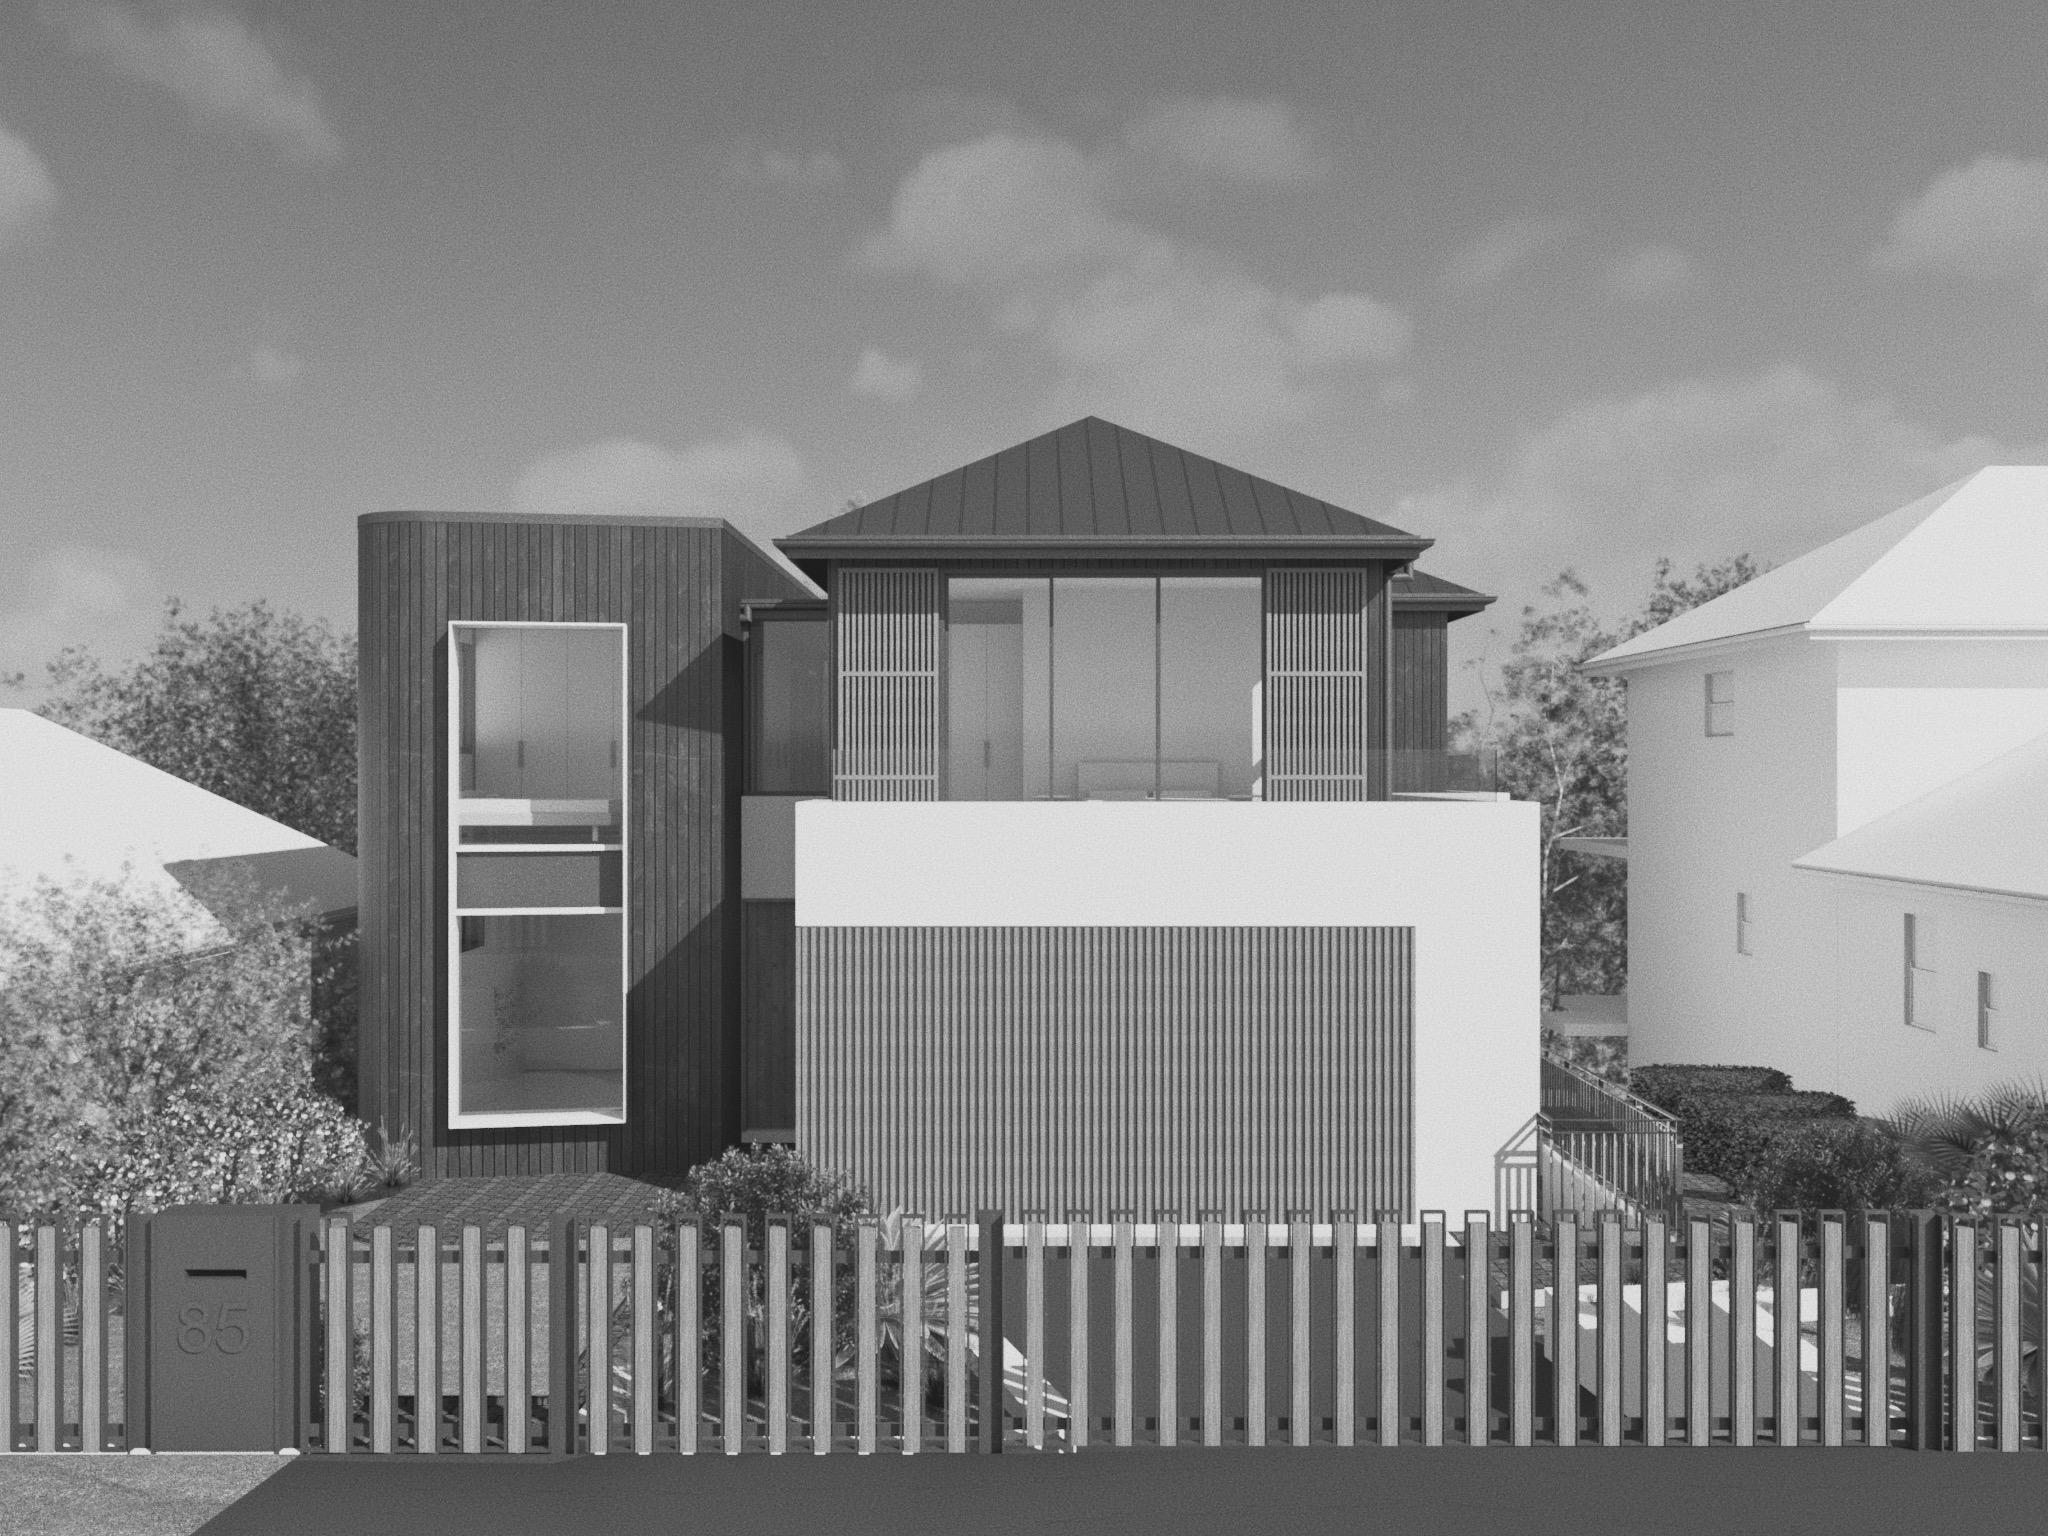 Lane Cove Project 1 - New dwelling